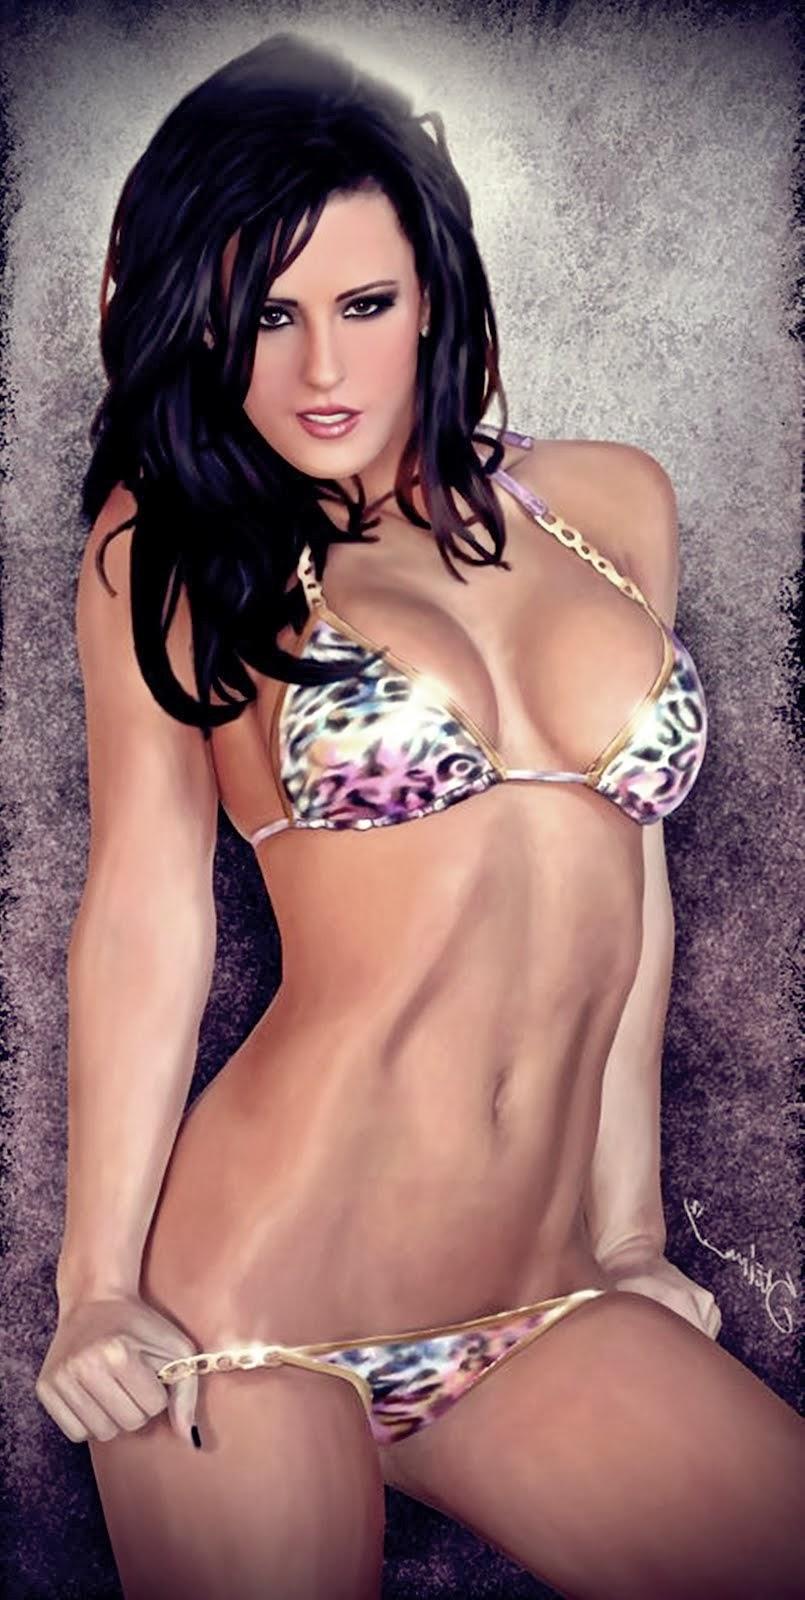 amie yancey hot nude